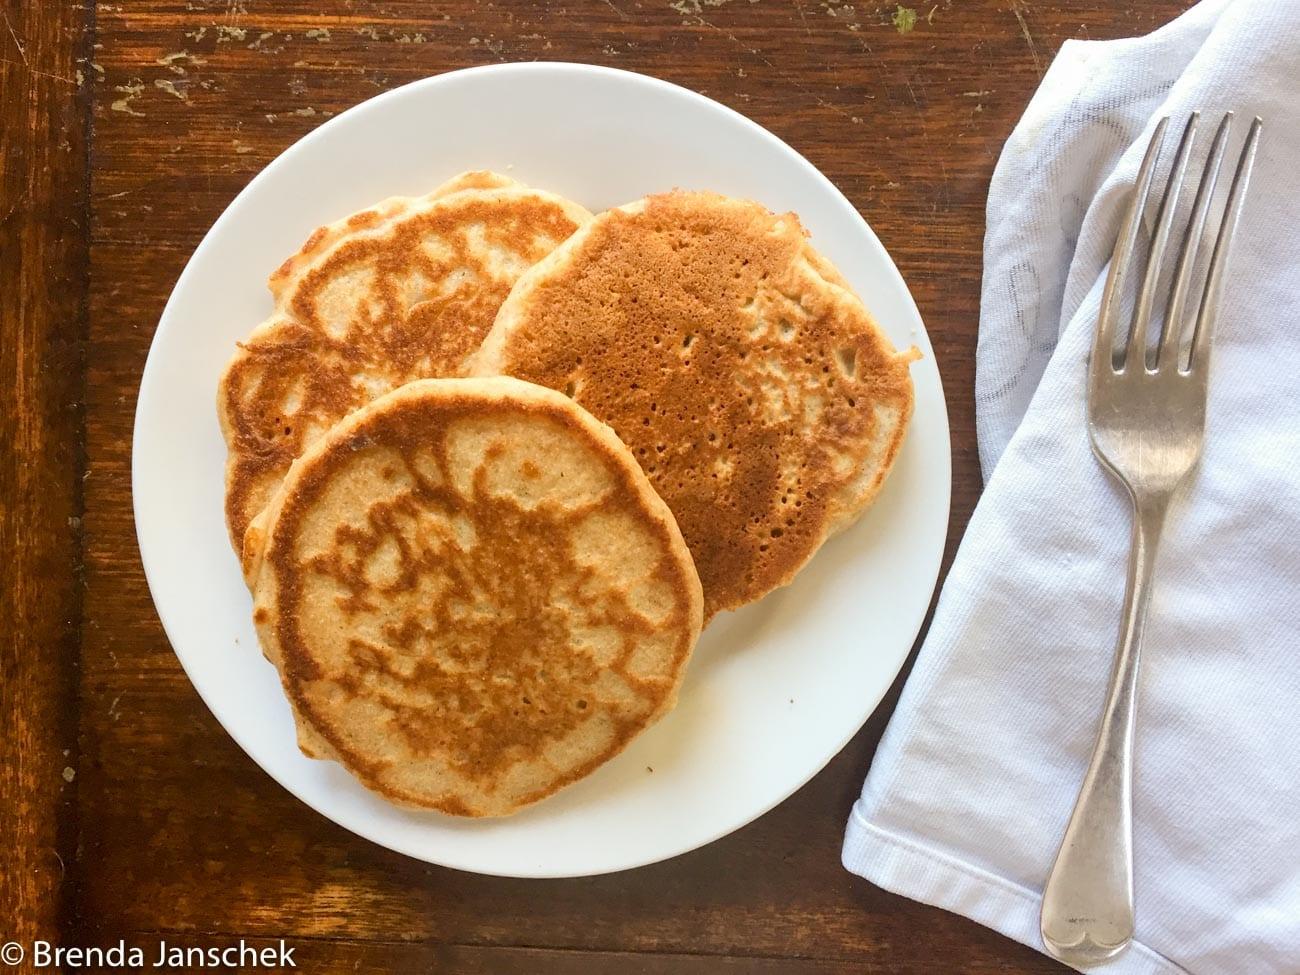 Brenda-Janschek-Recipe-Pancakes-Feature.jpg